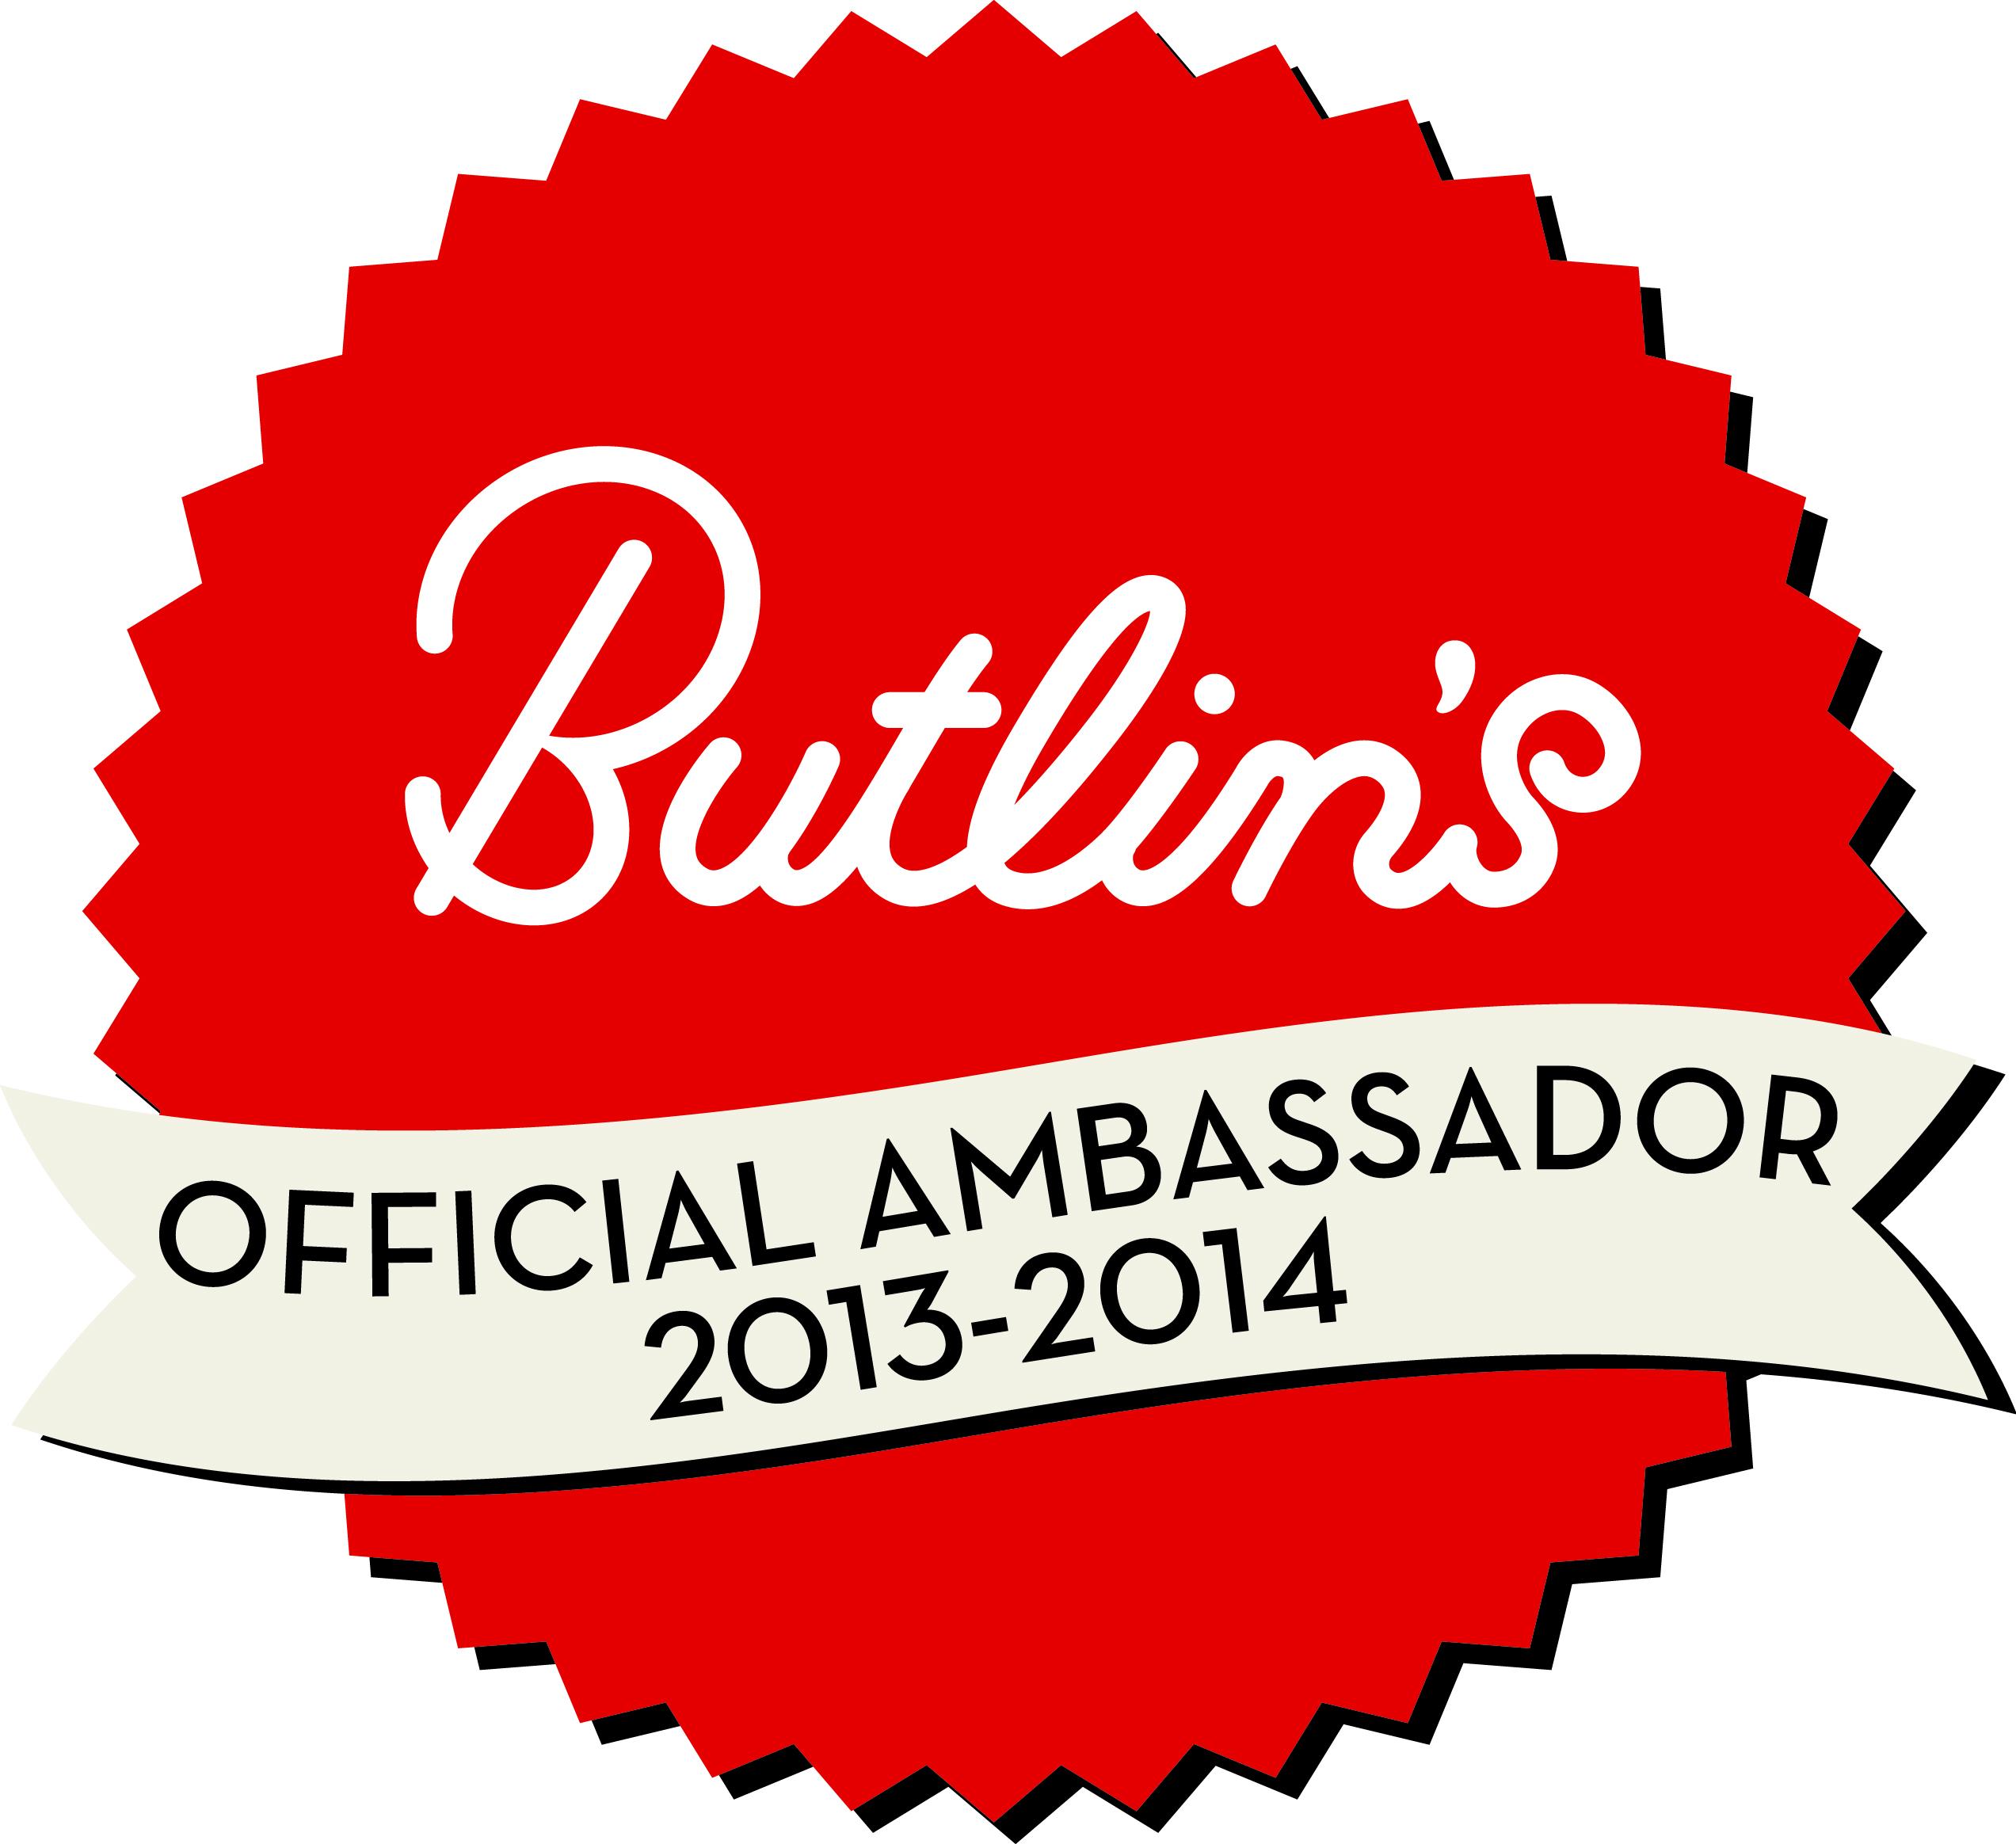 Butlins Ambassador 2013-2014